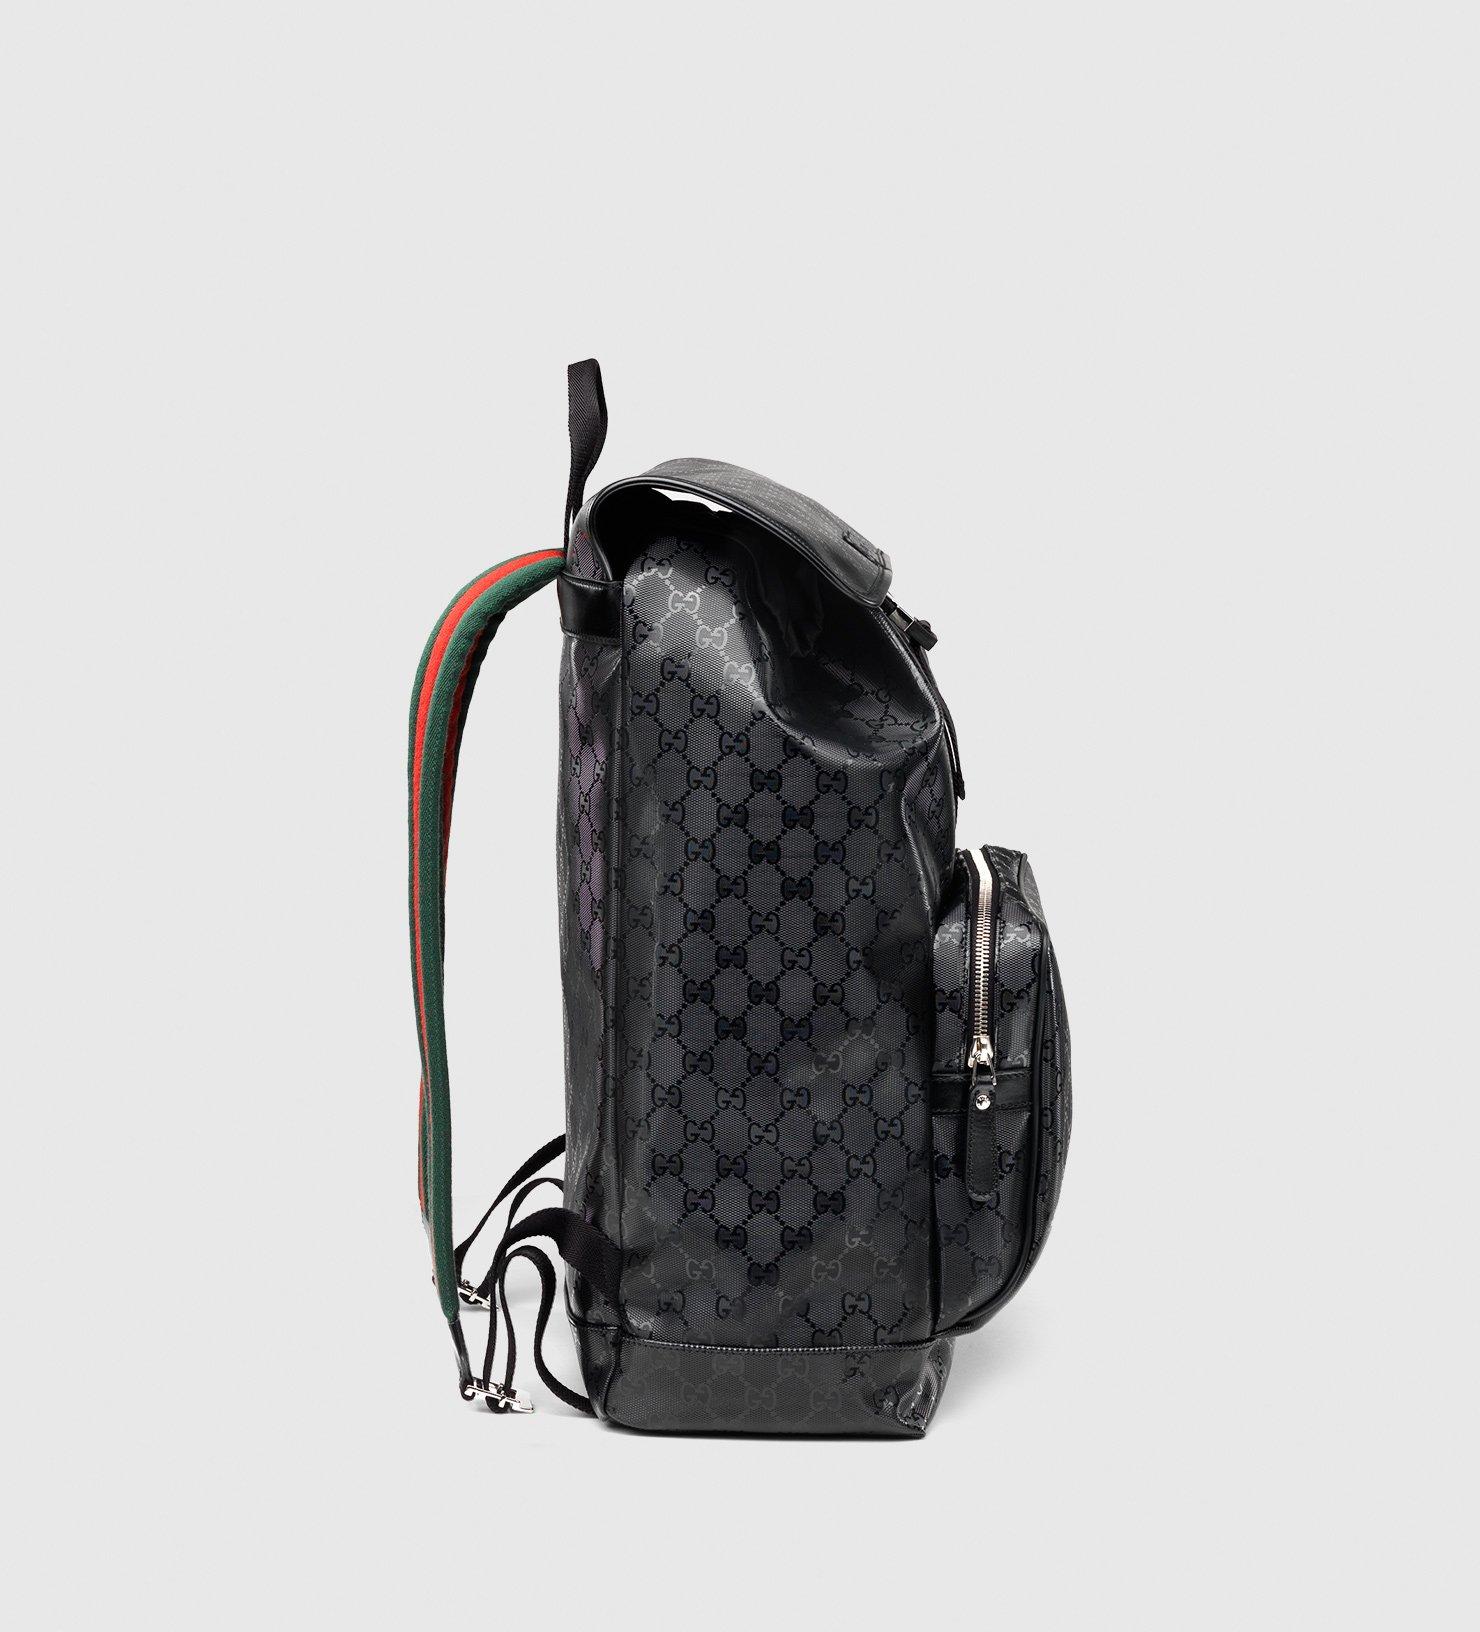 Lyst - Gucci 500 By Gg Imprimé Backpack in Black de24dc29d3